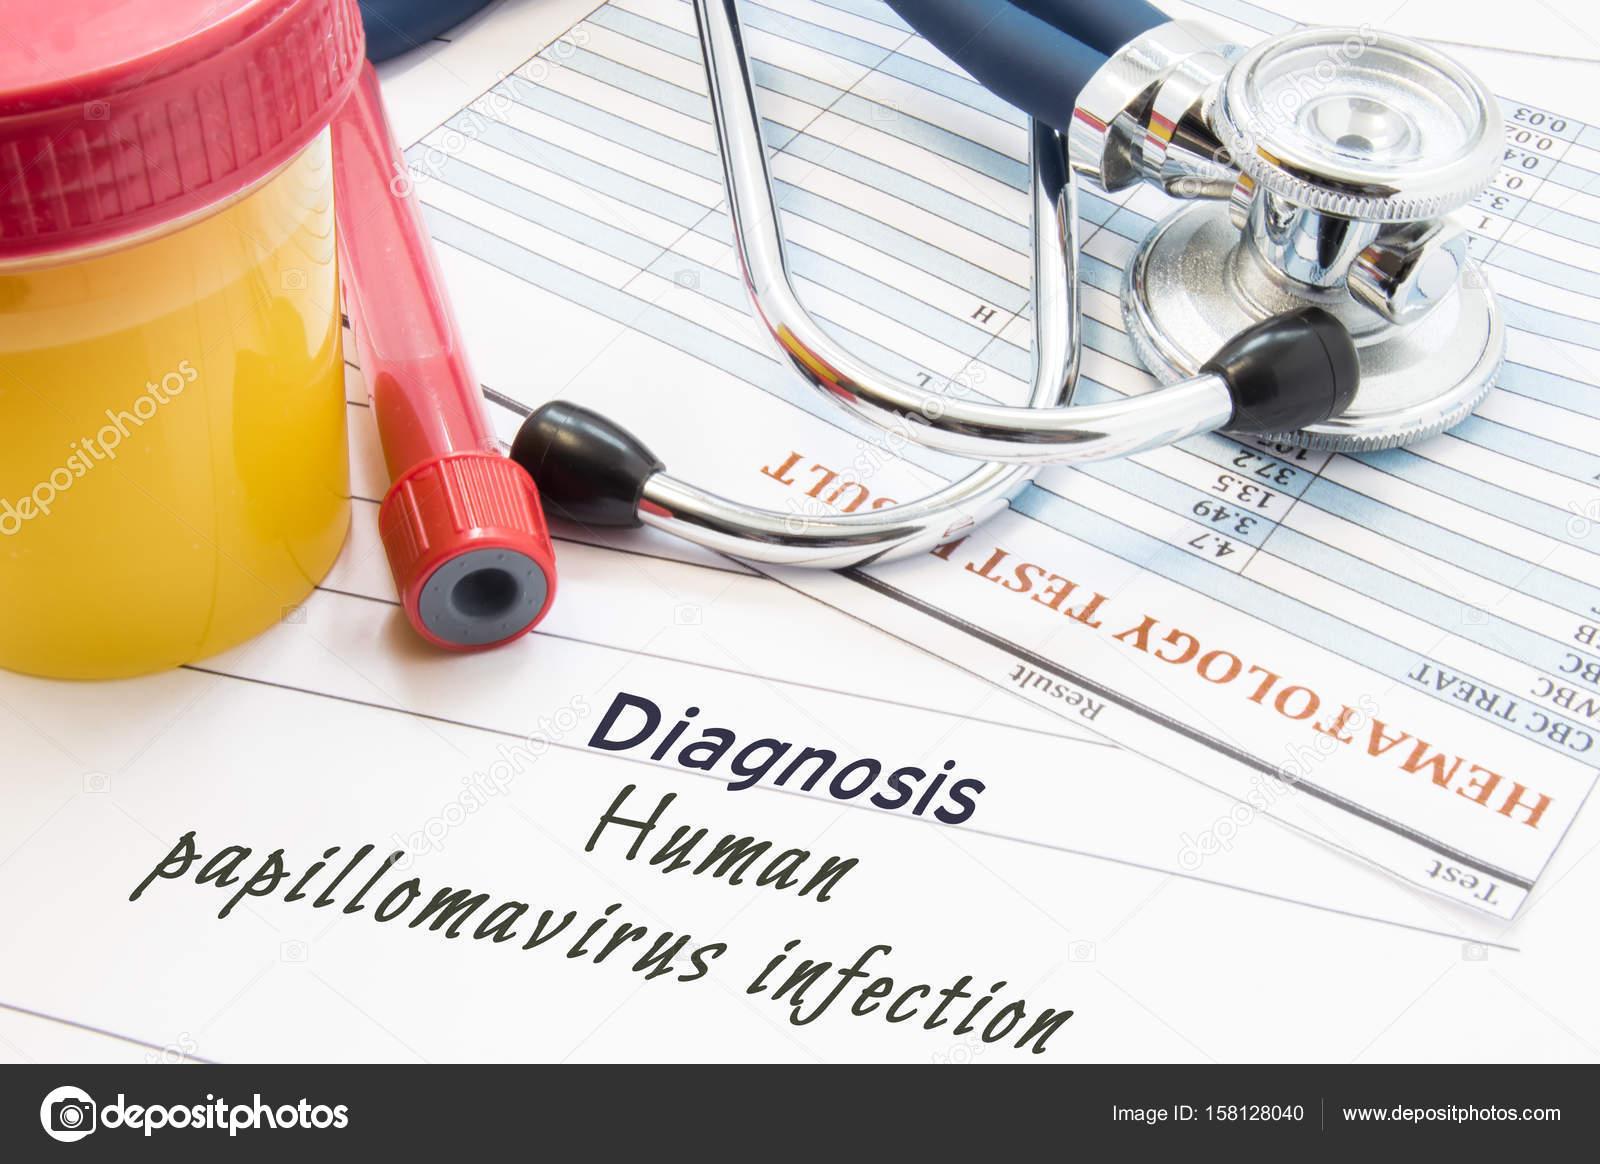 human papillomavirus infection diagnosed)